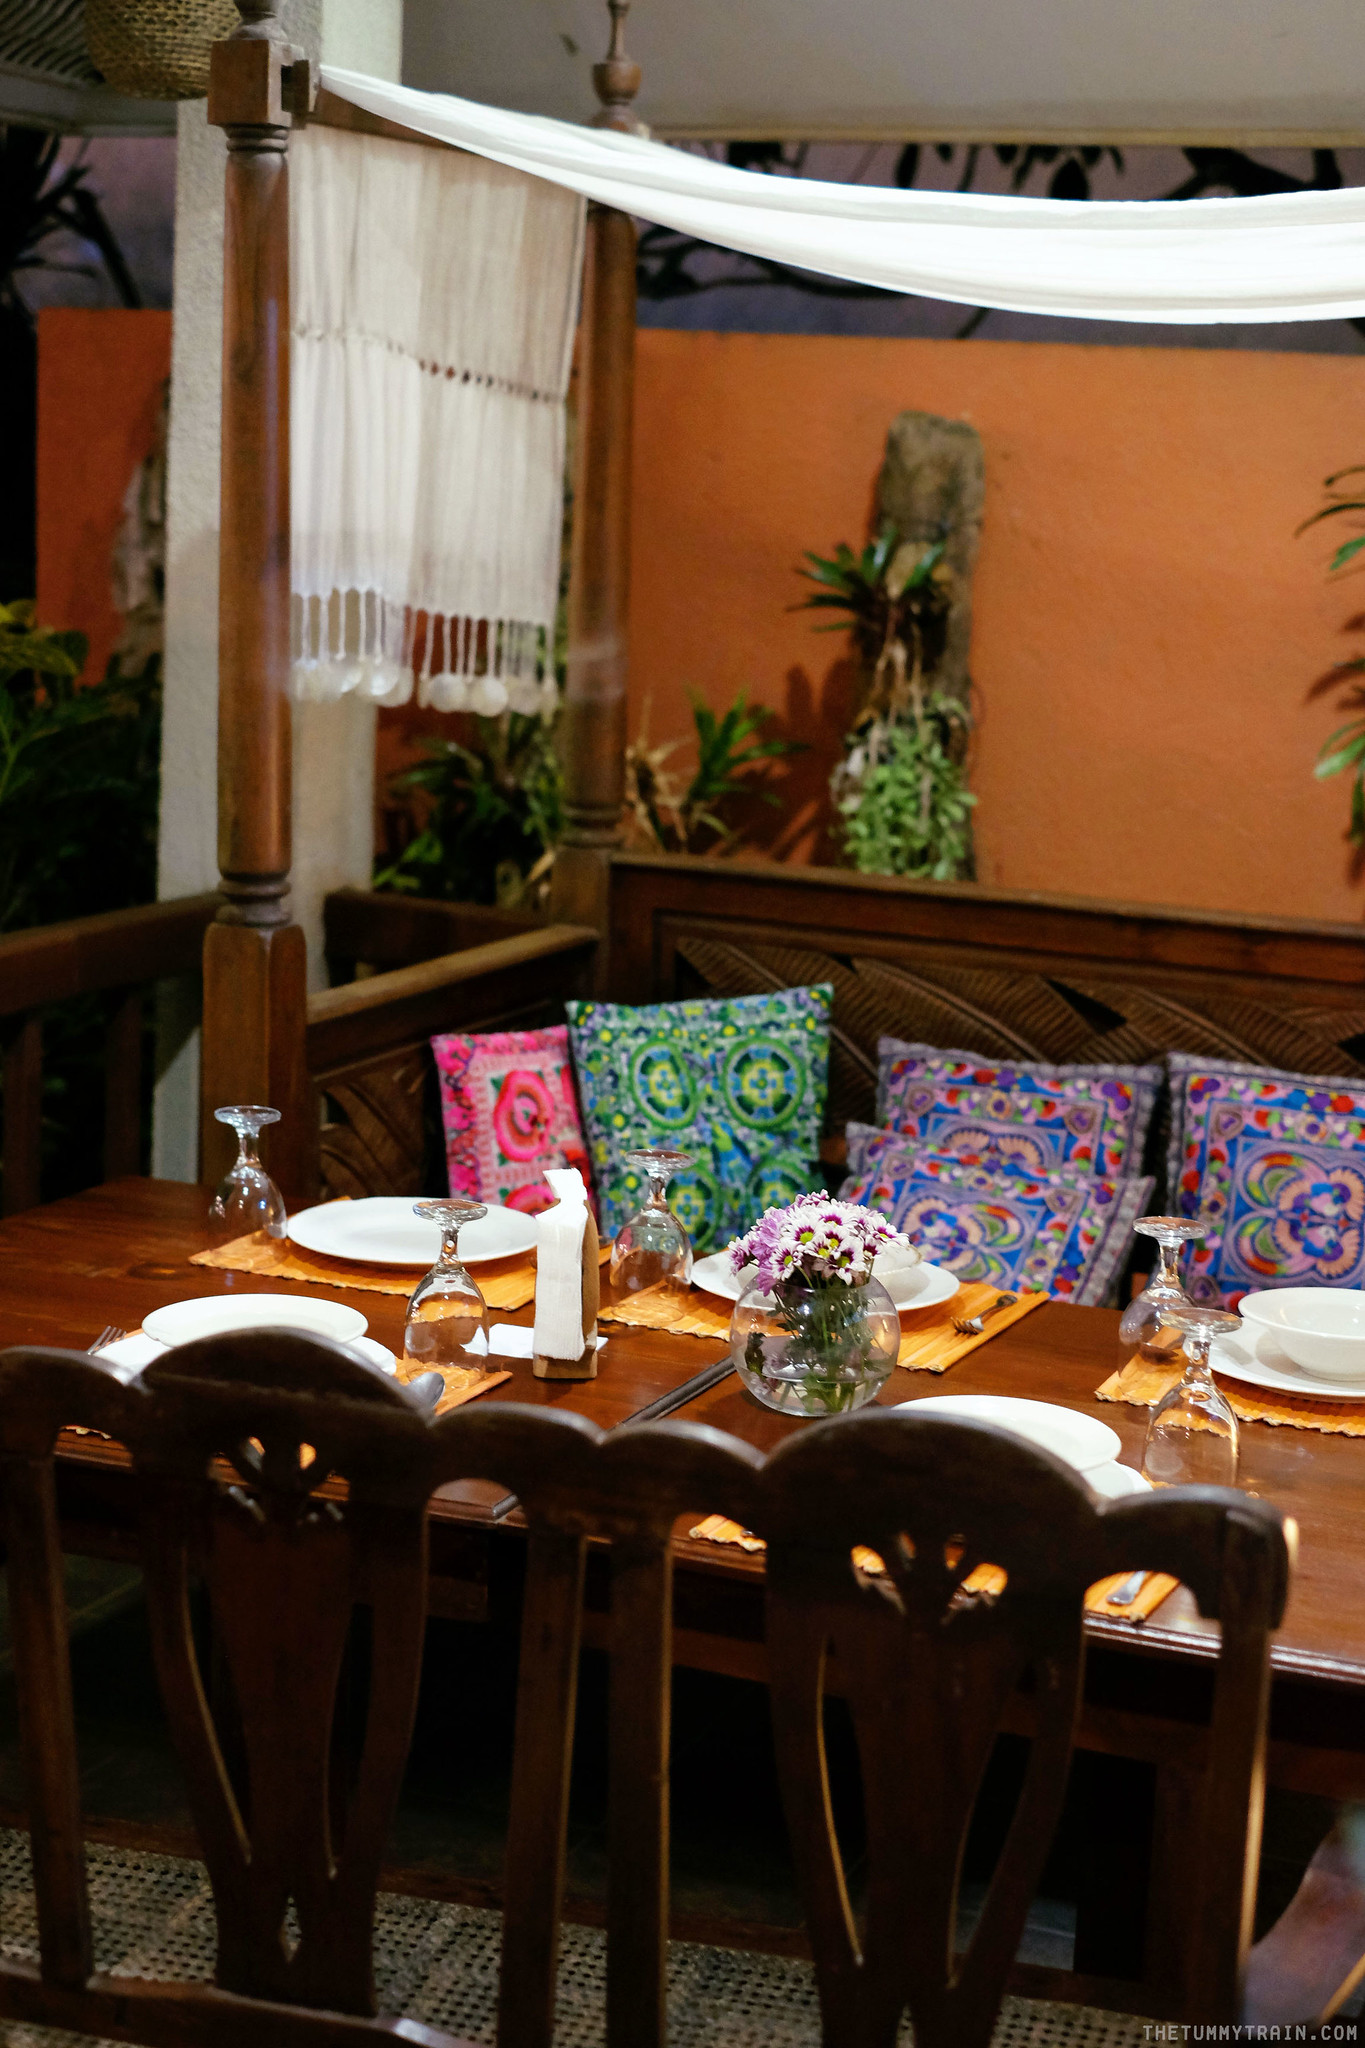 33014285434 05ba90c099 k - Lime & Basil Thai Restaurant Tagaytay makes case as a go-to Thai place